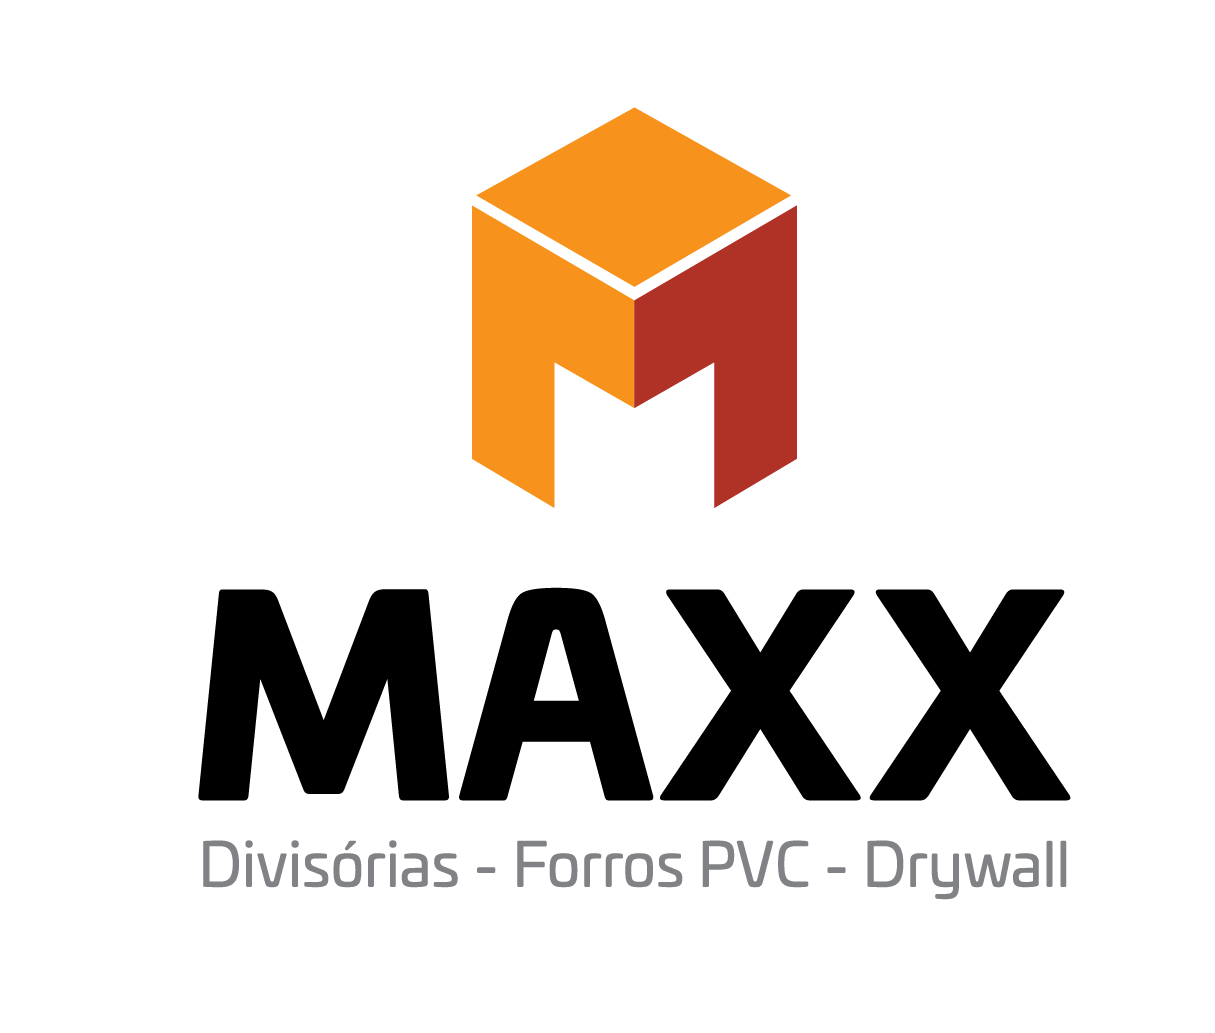 Forro de Pvc com Isolamento Térmico para Comprar Casa Verde - Forro de Pvc Marrom - Maxx Forro